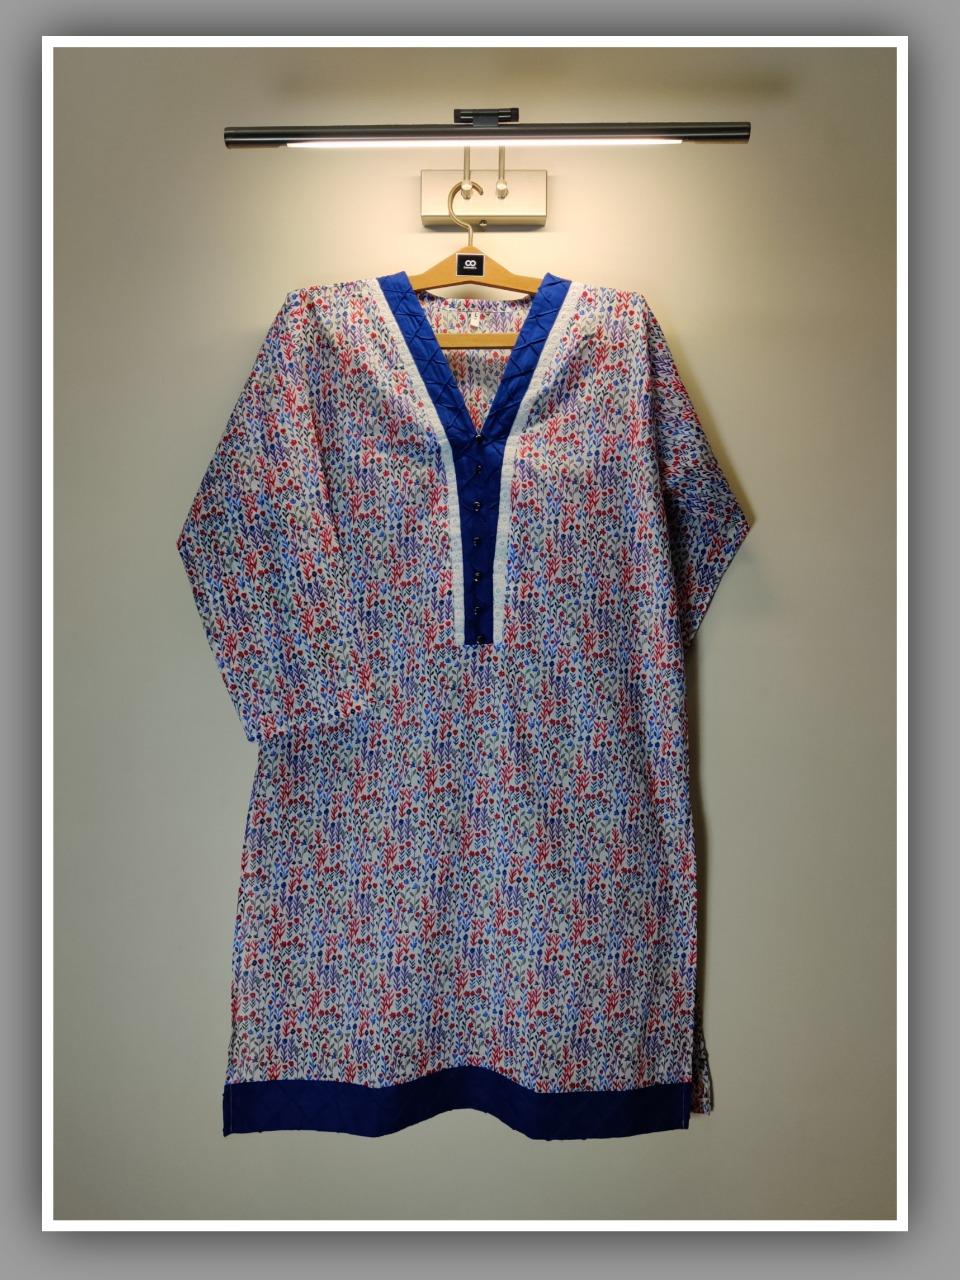 Original Nishat Linen Ready To Wear Lawn Kurti - Women Sellers on Daraz - Daraz Life